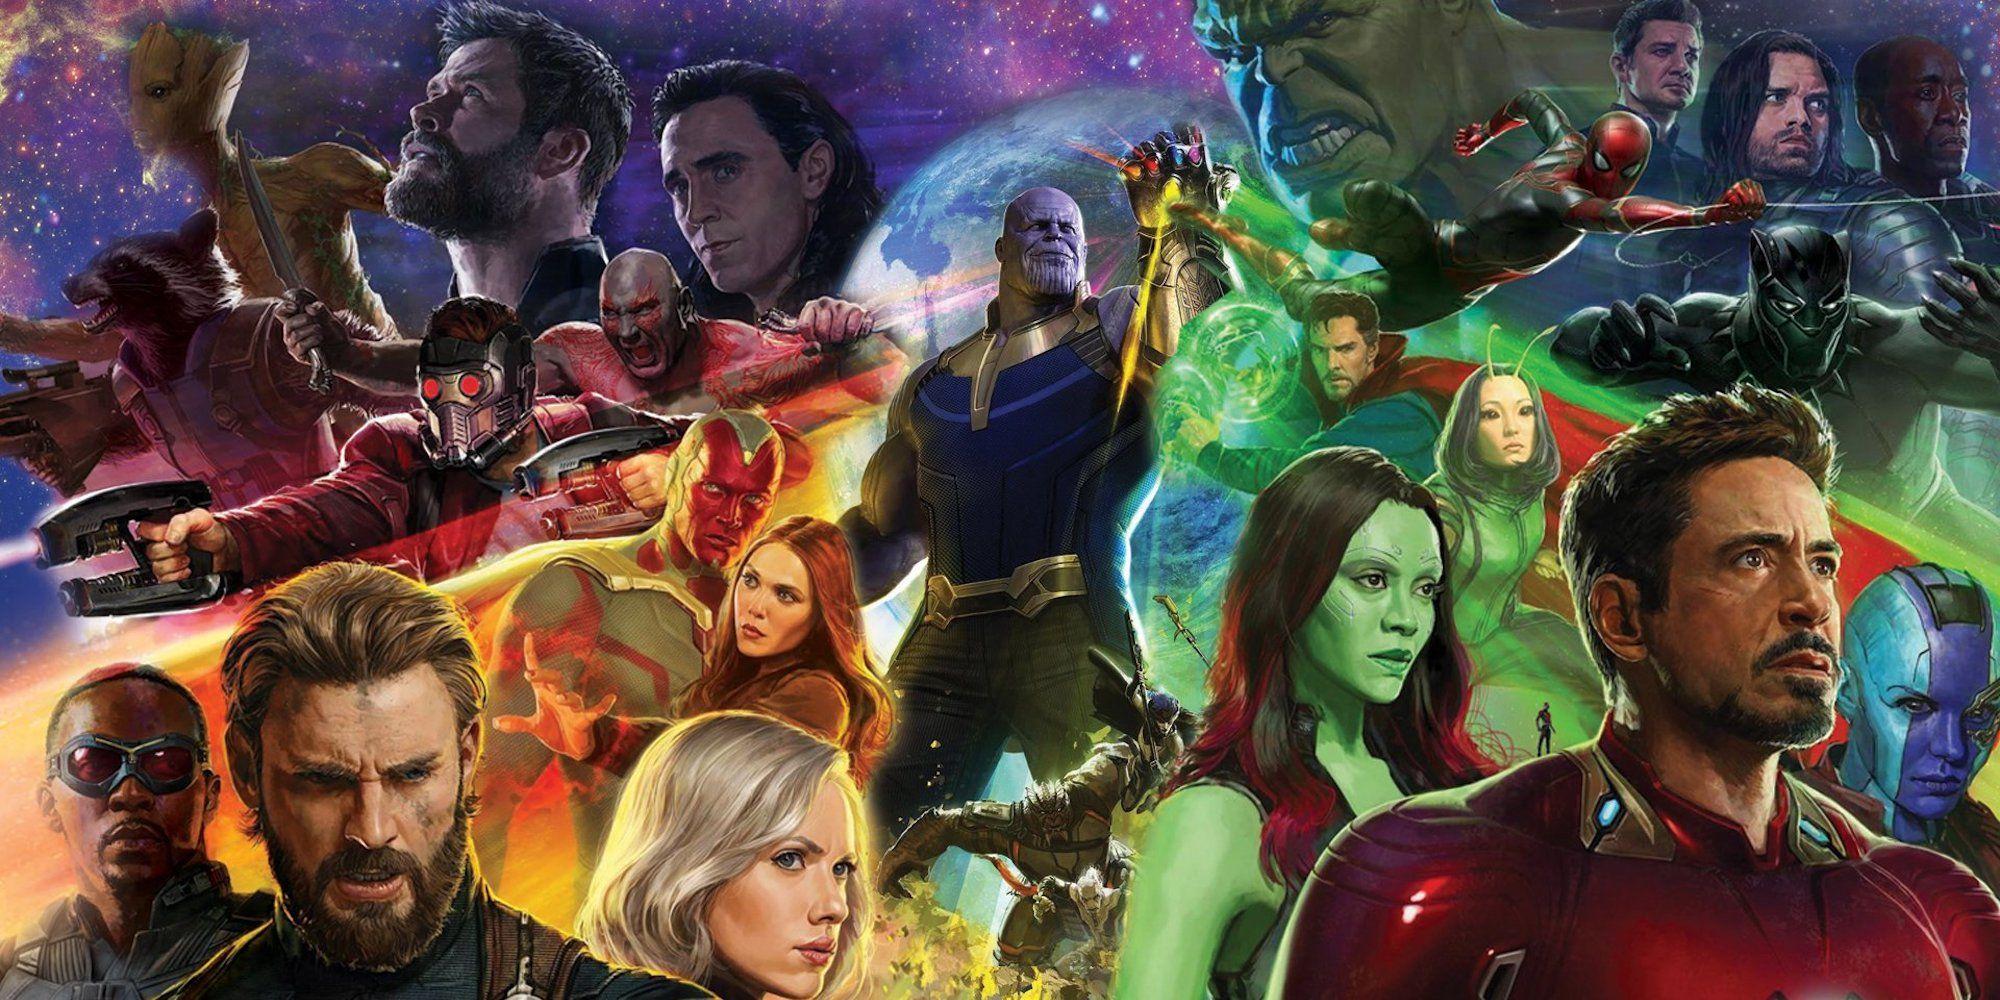 Avengers Infinity War Lego Set Bring Guardians Avengers Together